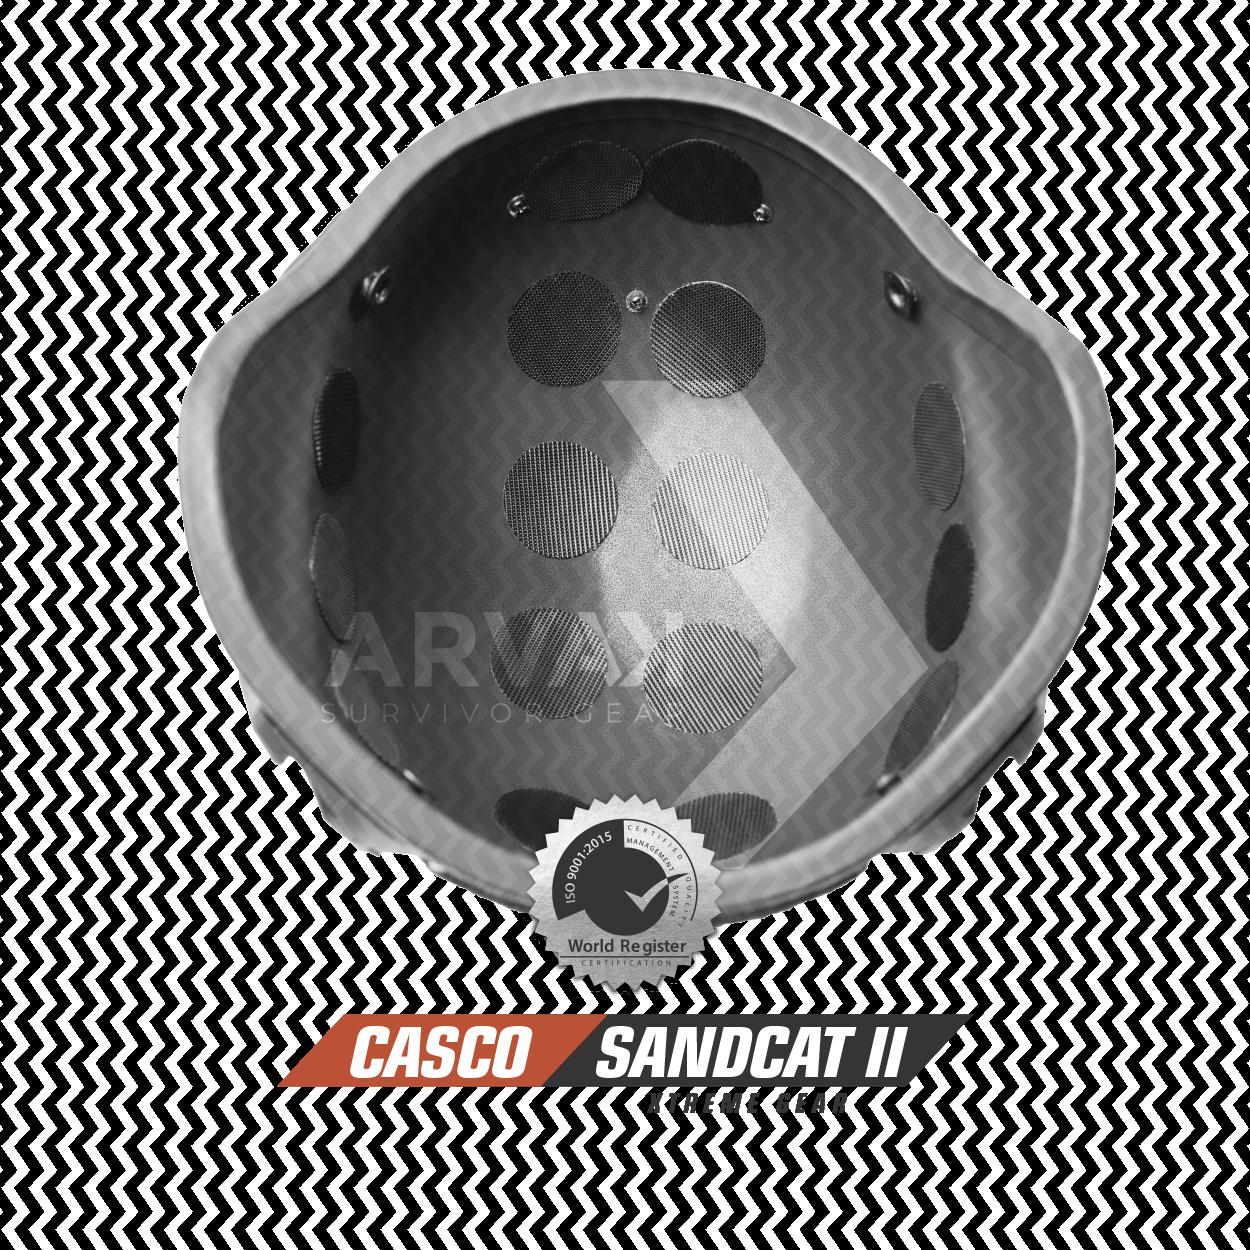 Casco sandcat-II Arvak Tactical